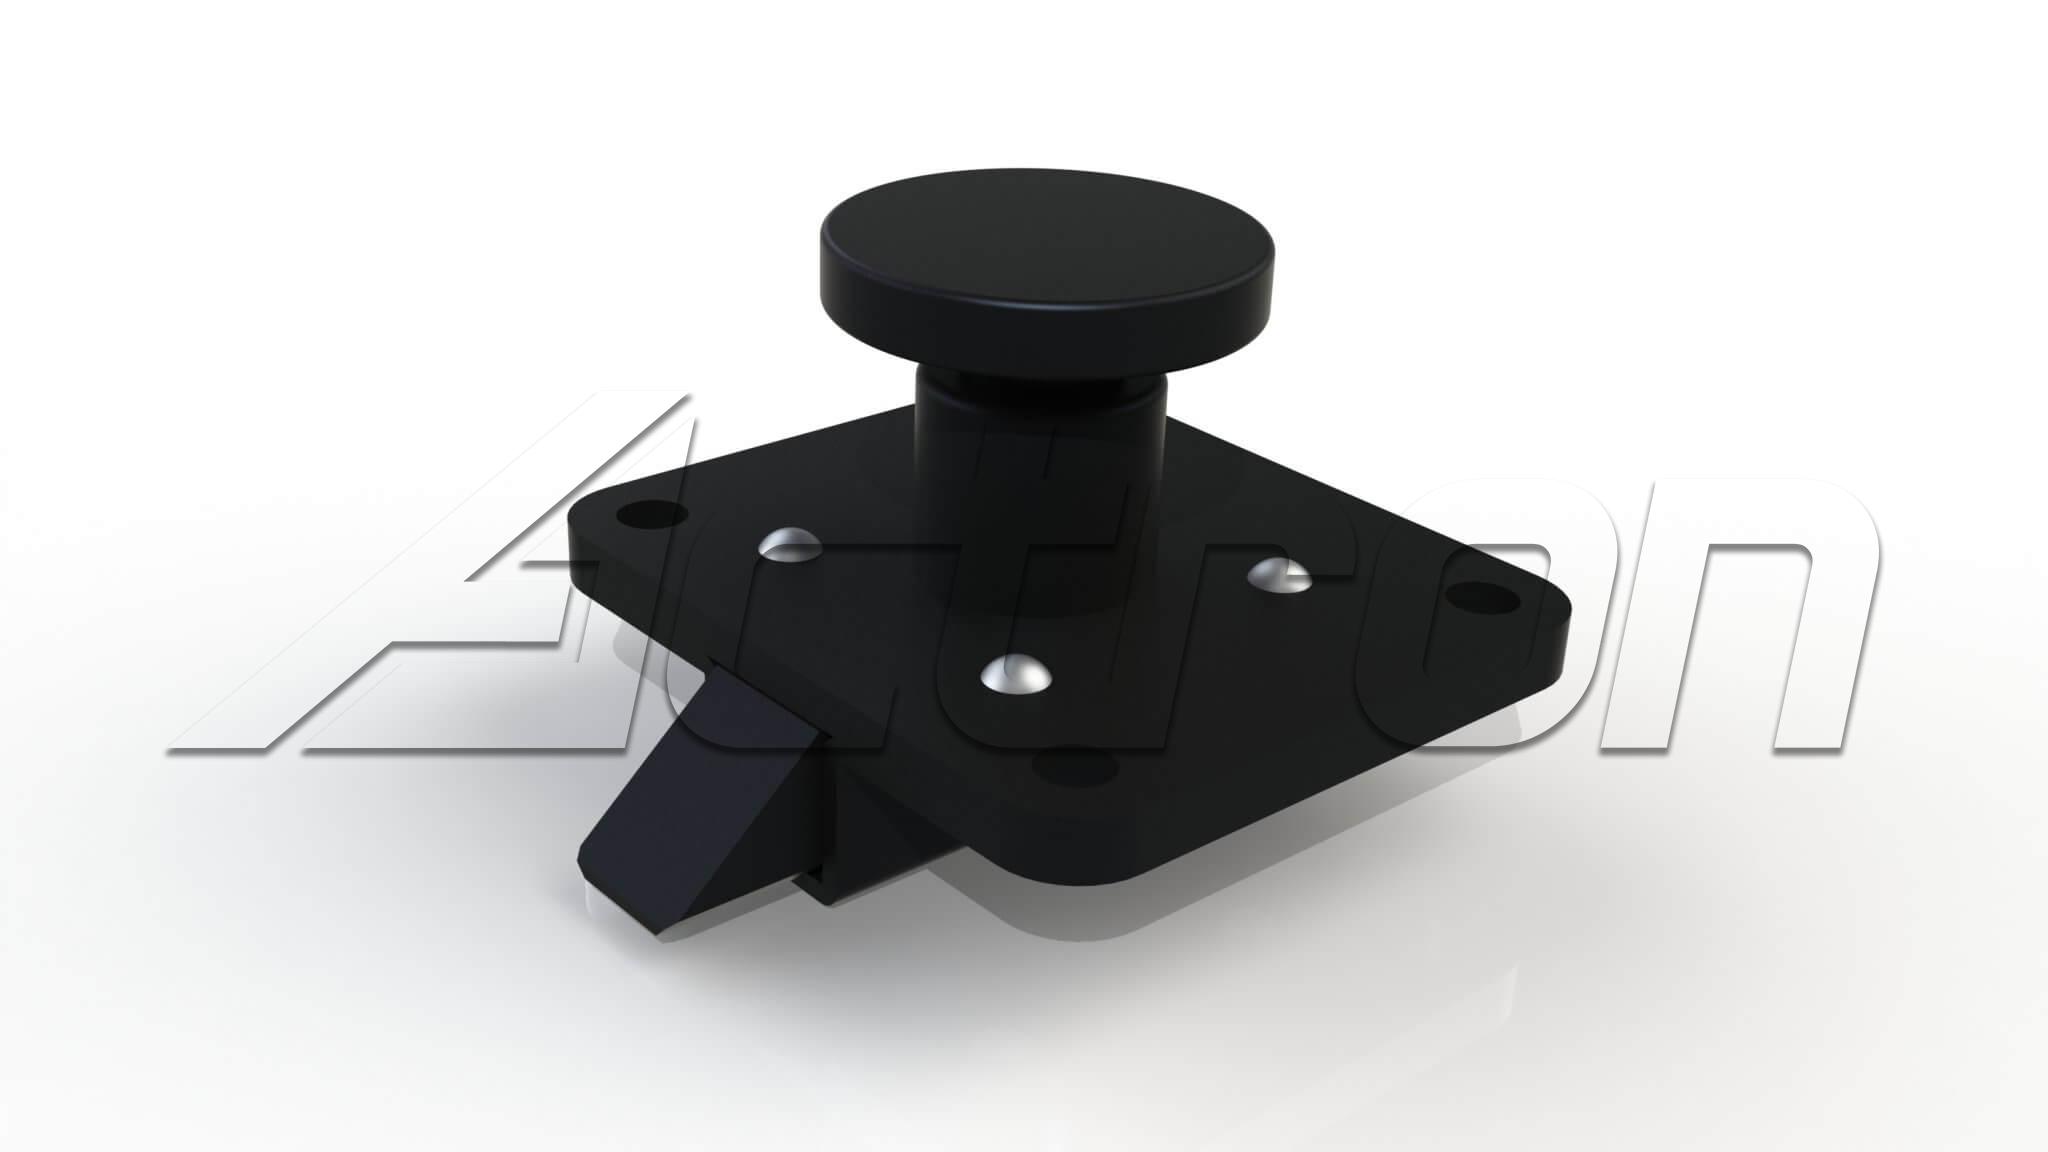 latch-assy-8211-push-button-3976-a30028.jpg